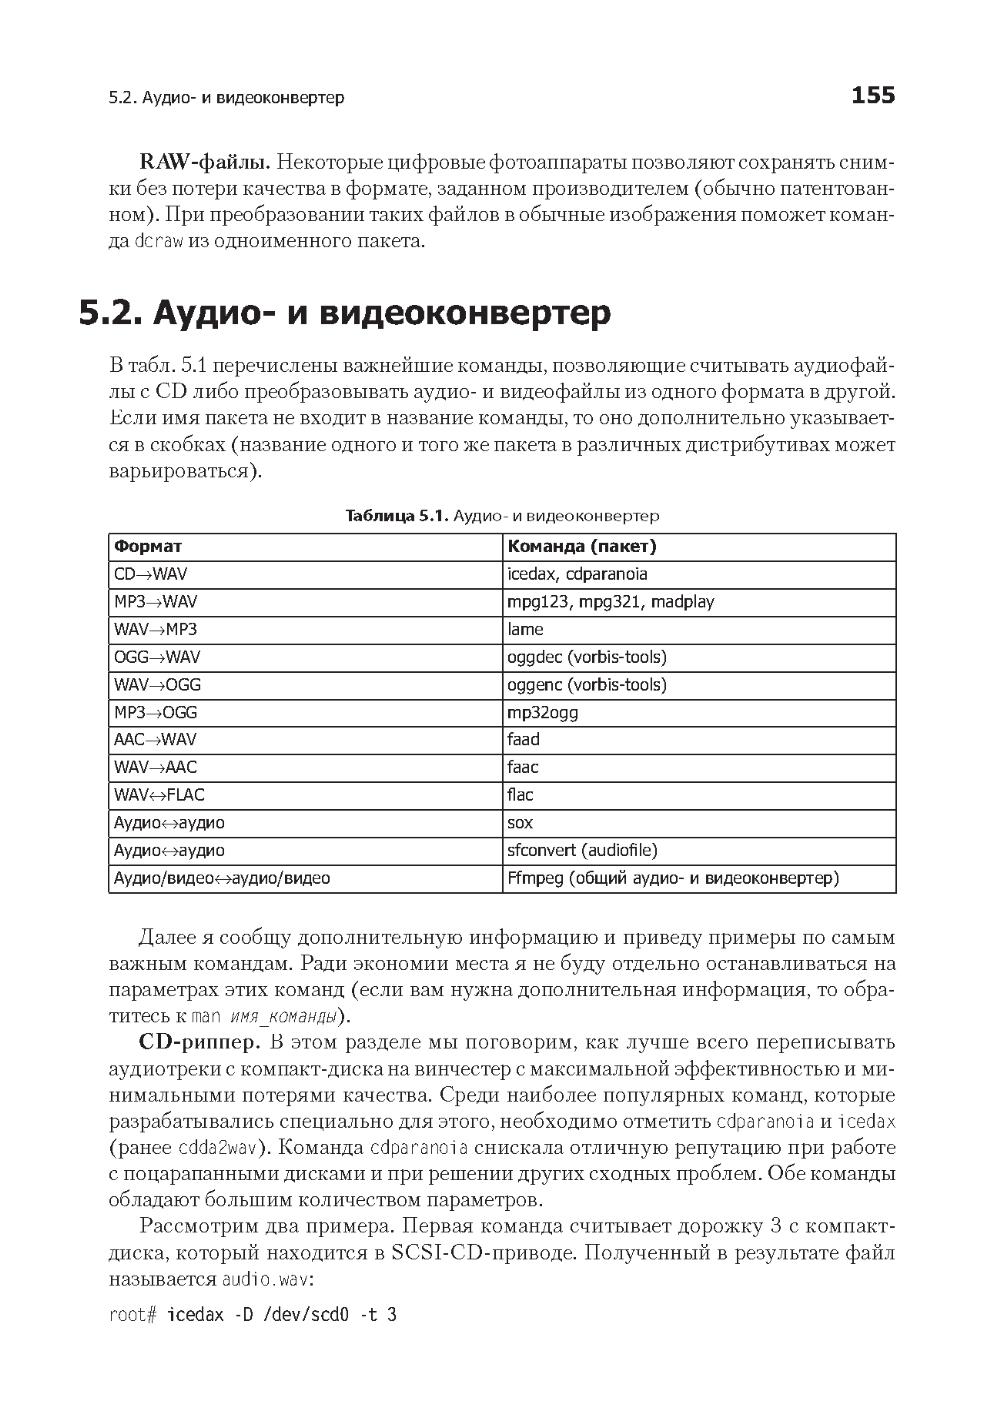 http://i6.imageban.ru/out/2014/01/23/635f25ac413d2c7a6535411ef020f60a.jpg